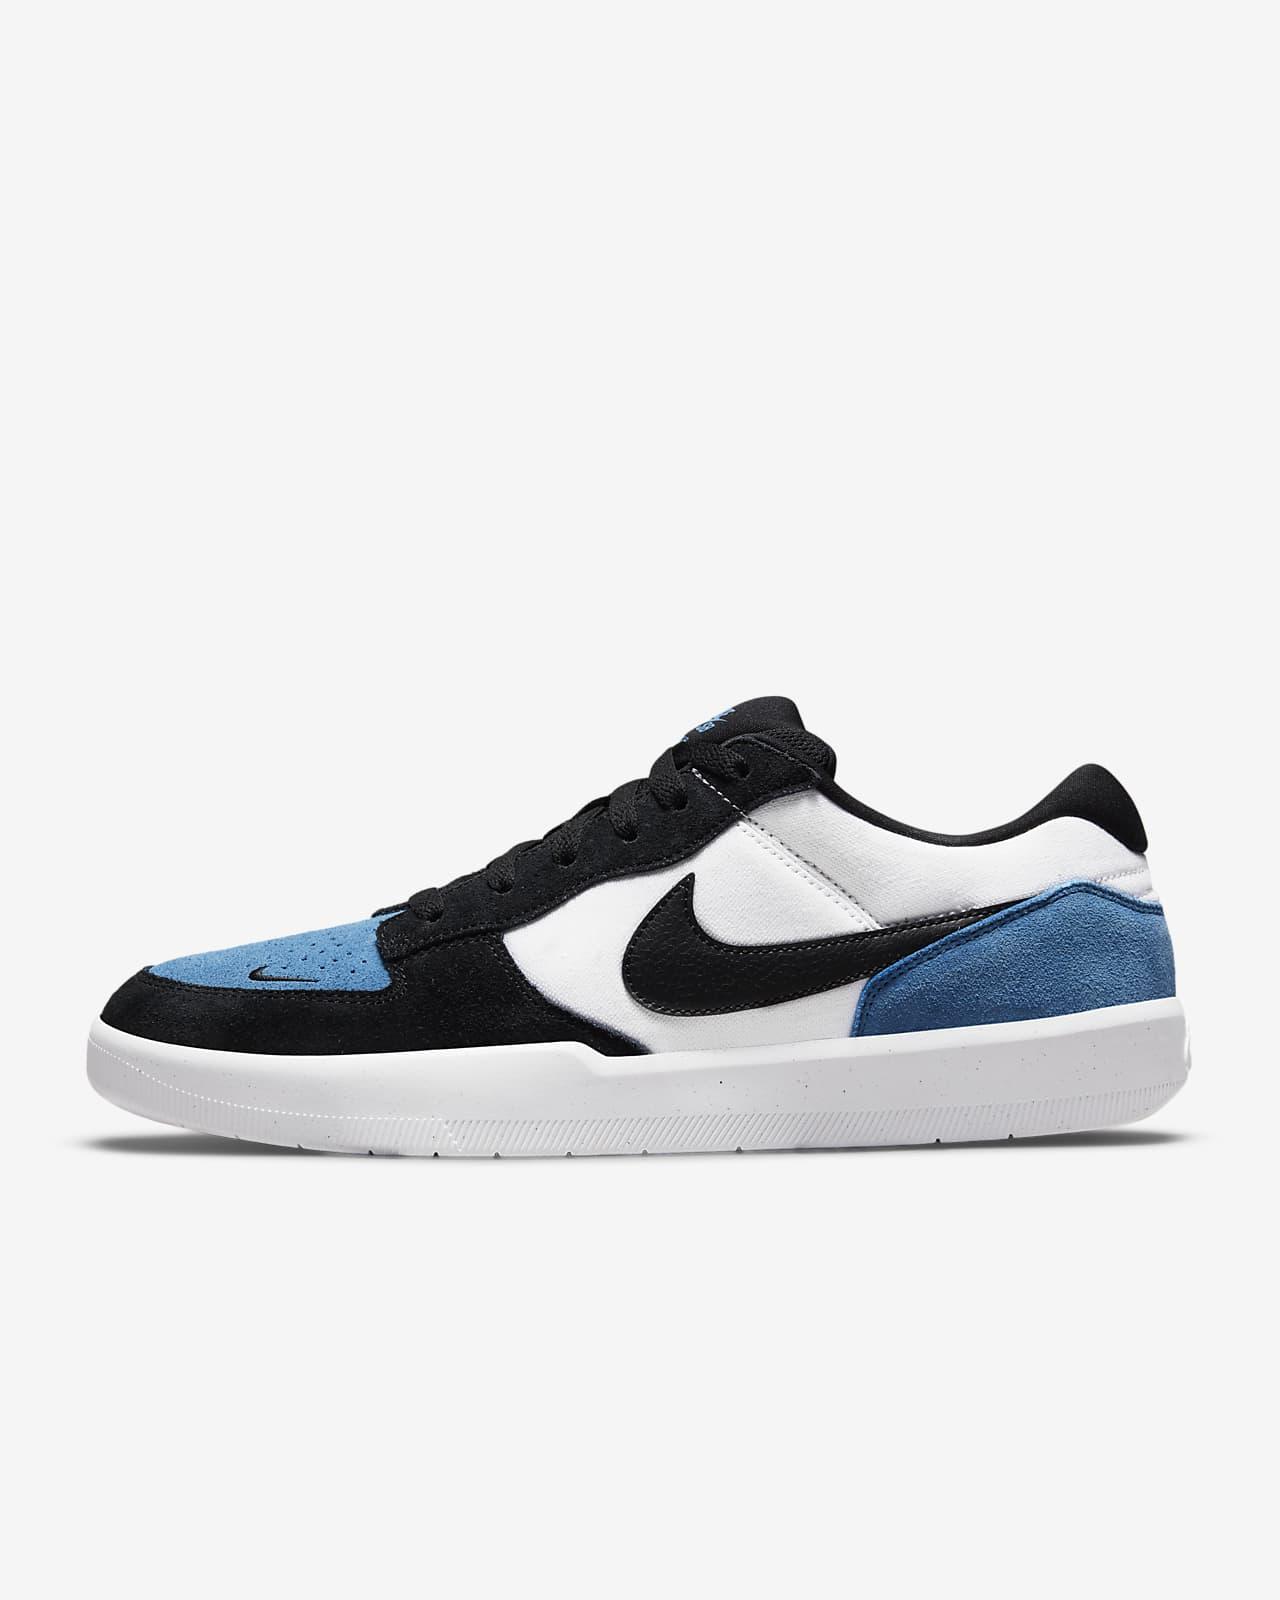 Nike SB Force 58 Skate Shoe